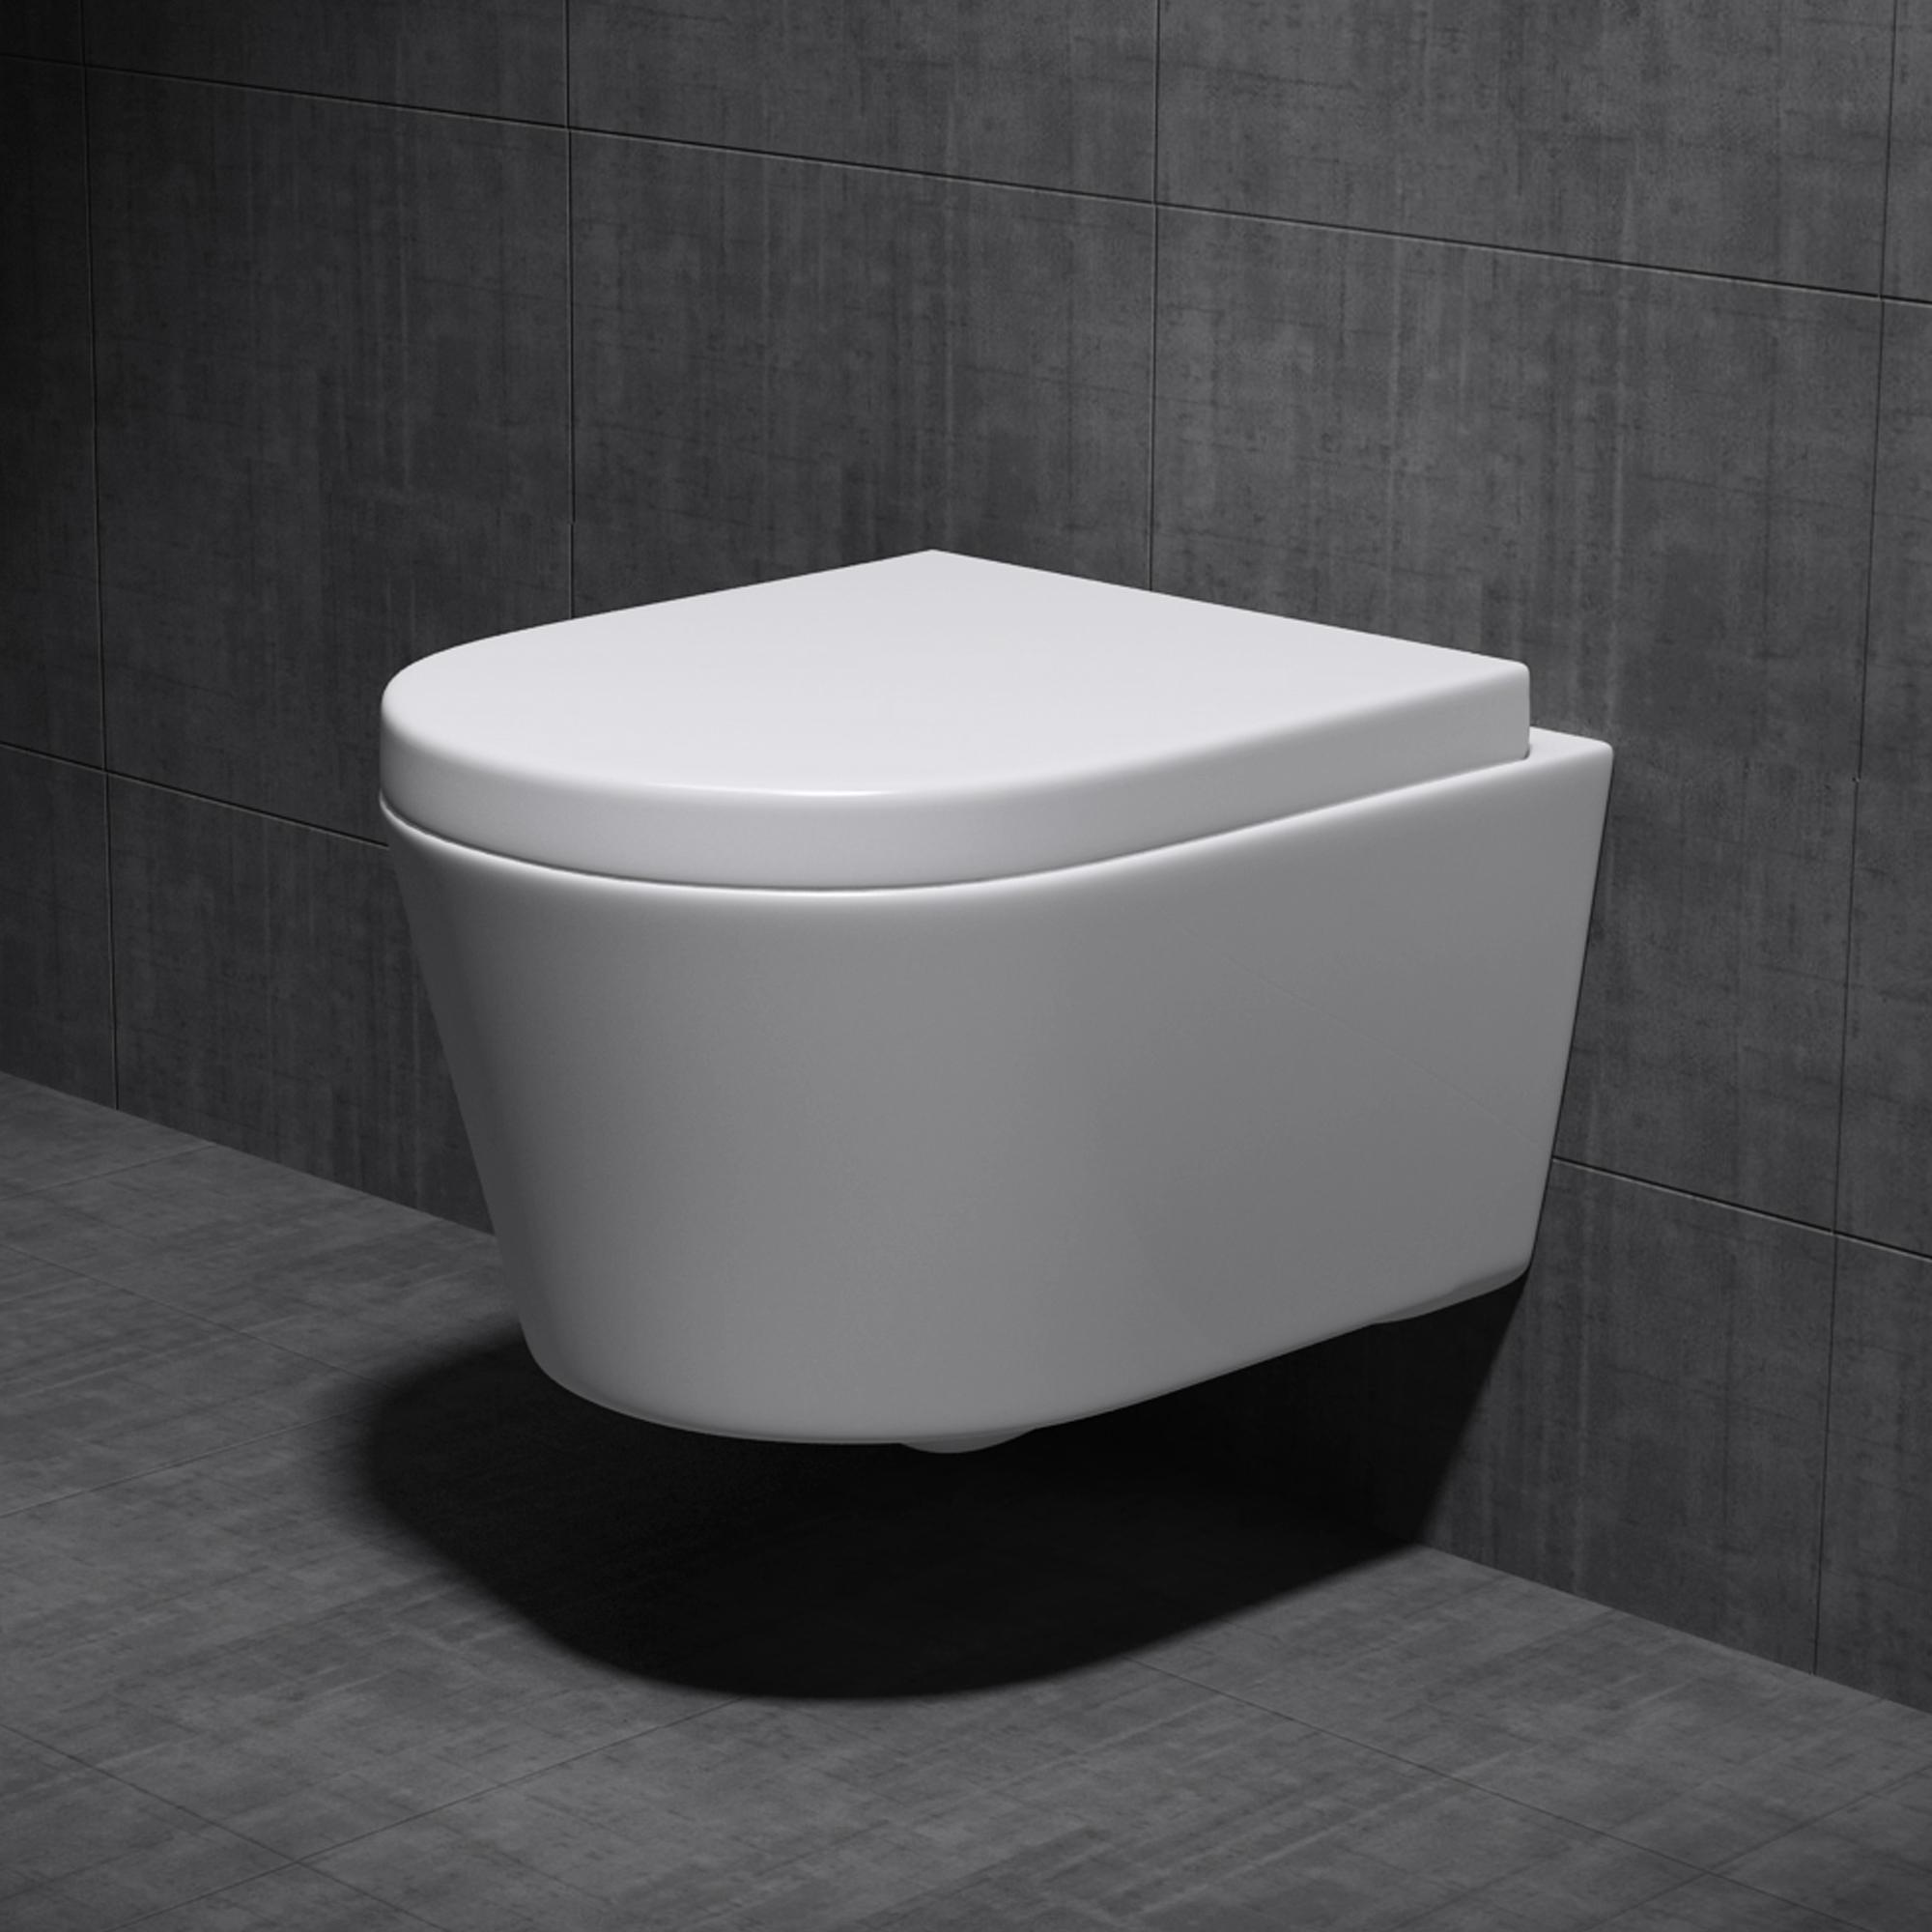 Sogood Edle Design Toilette Hänge-WC mit komfortablem Silent-Close-Sitz A101